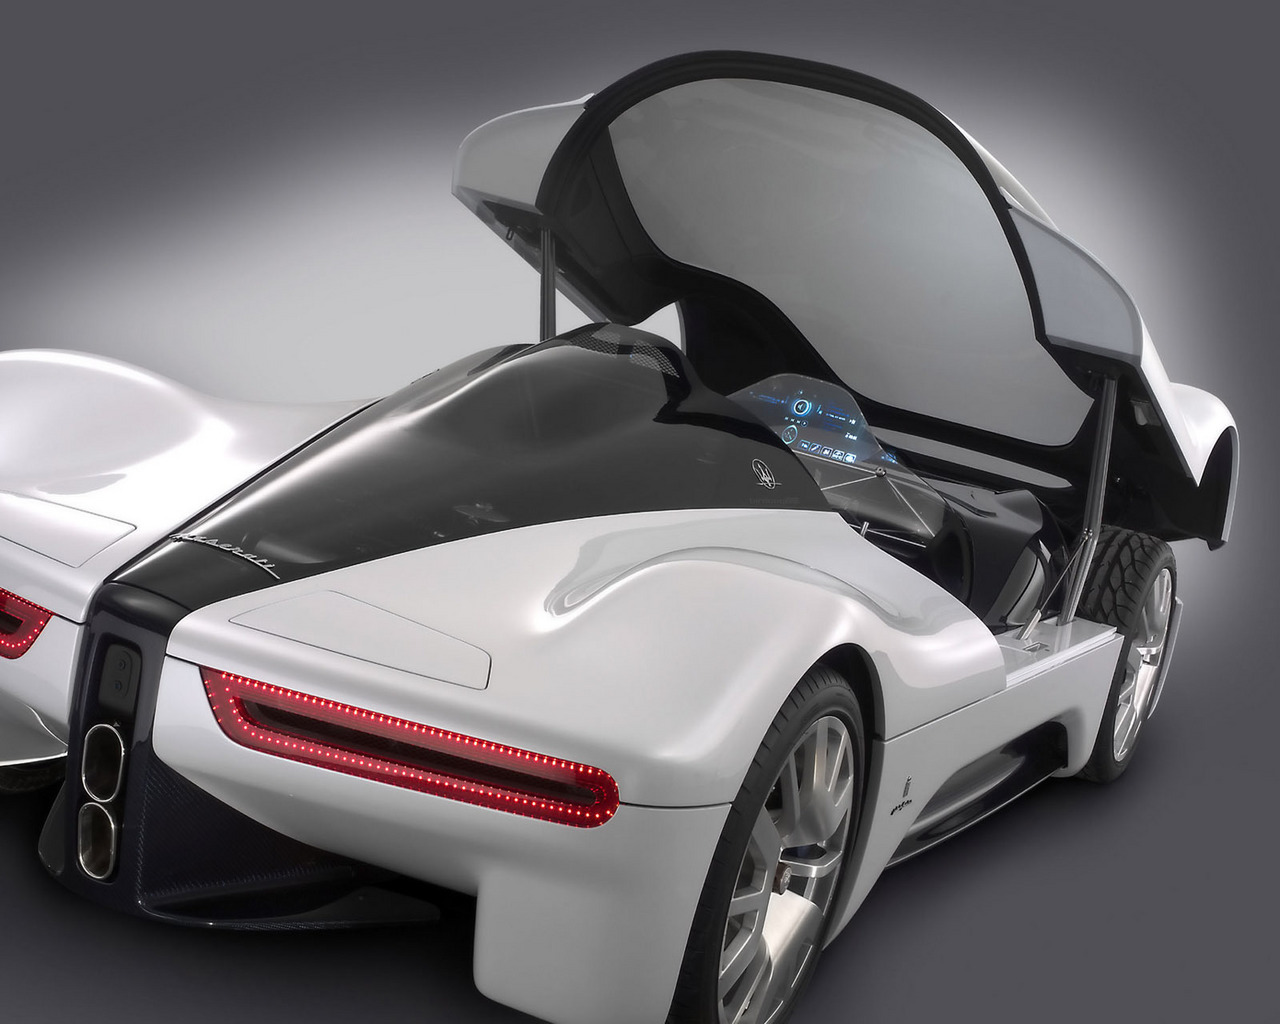 2005-Pininfarina-Maserati-Birdcage-Concept-RS-Raised-Canopy-1600x1200.jpg